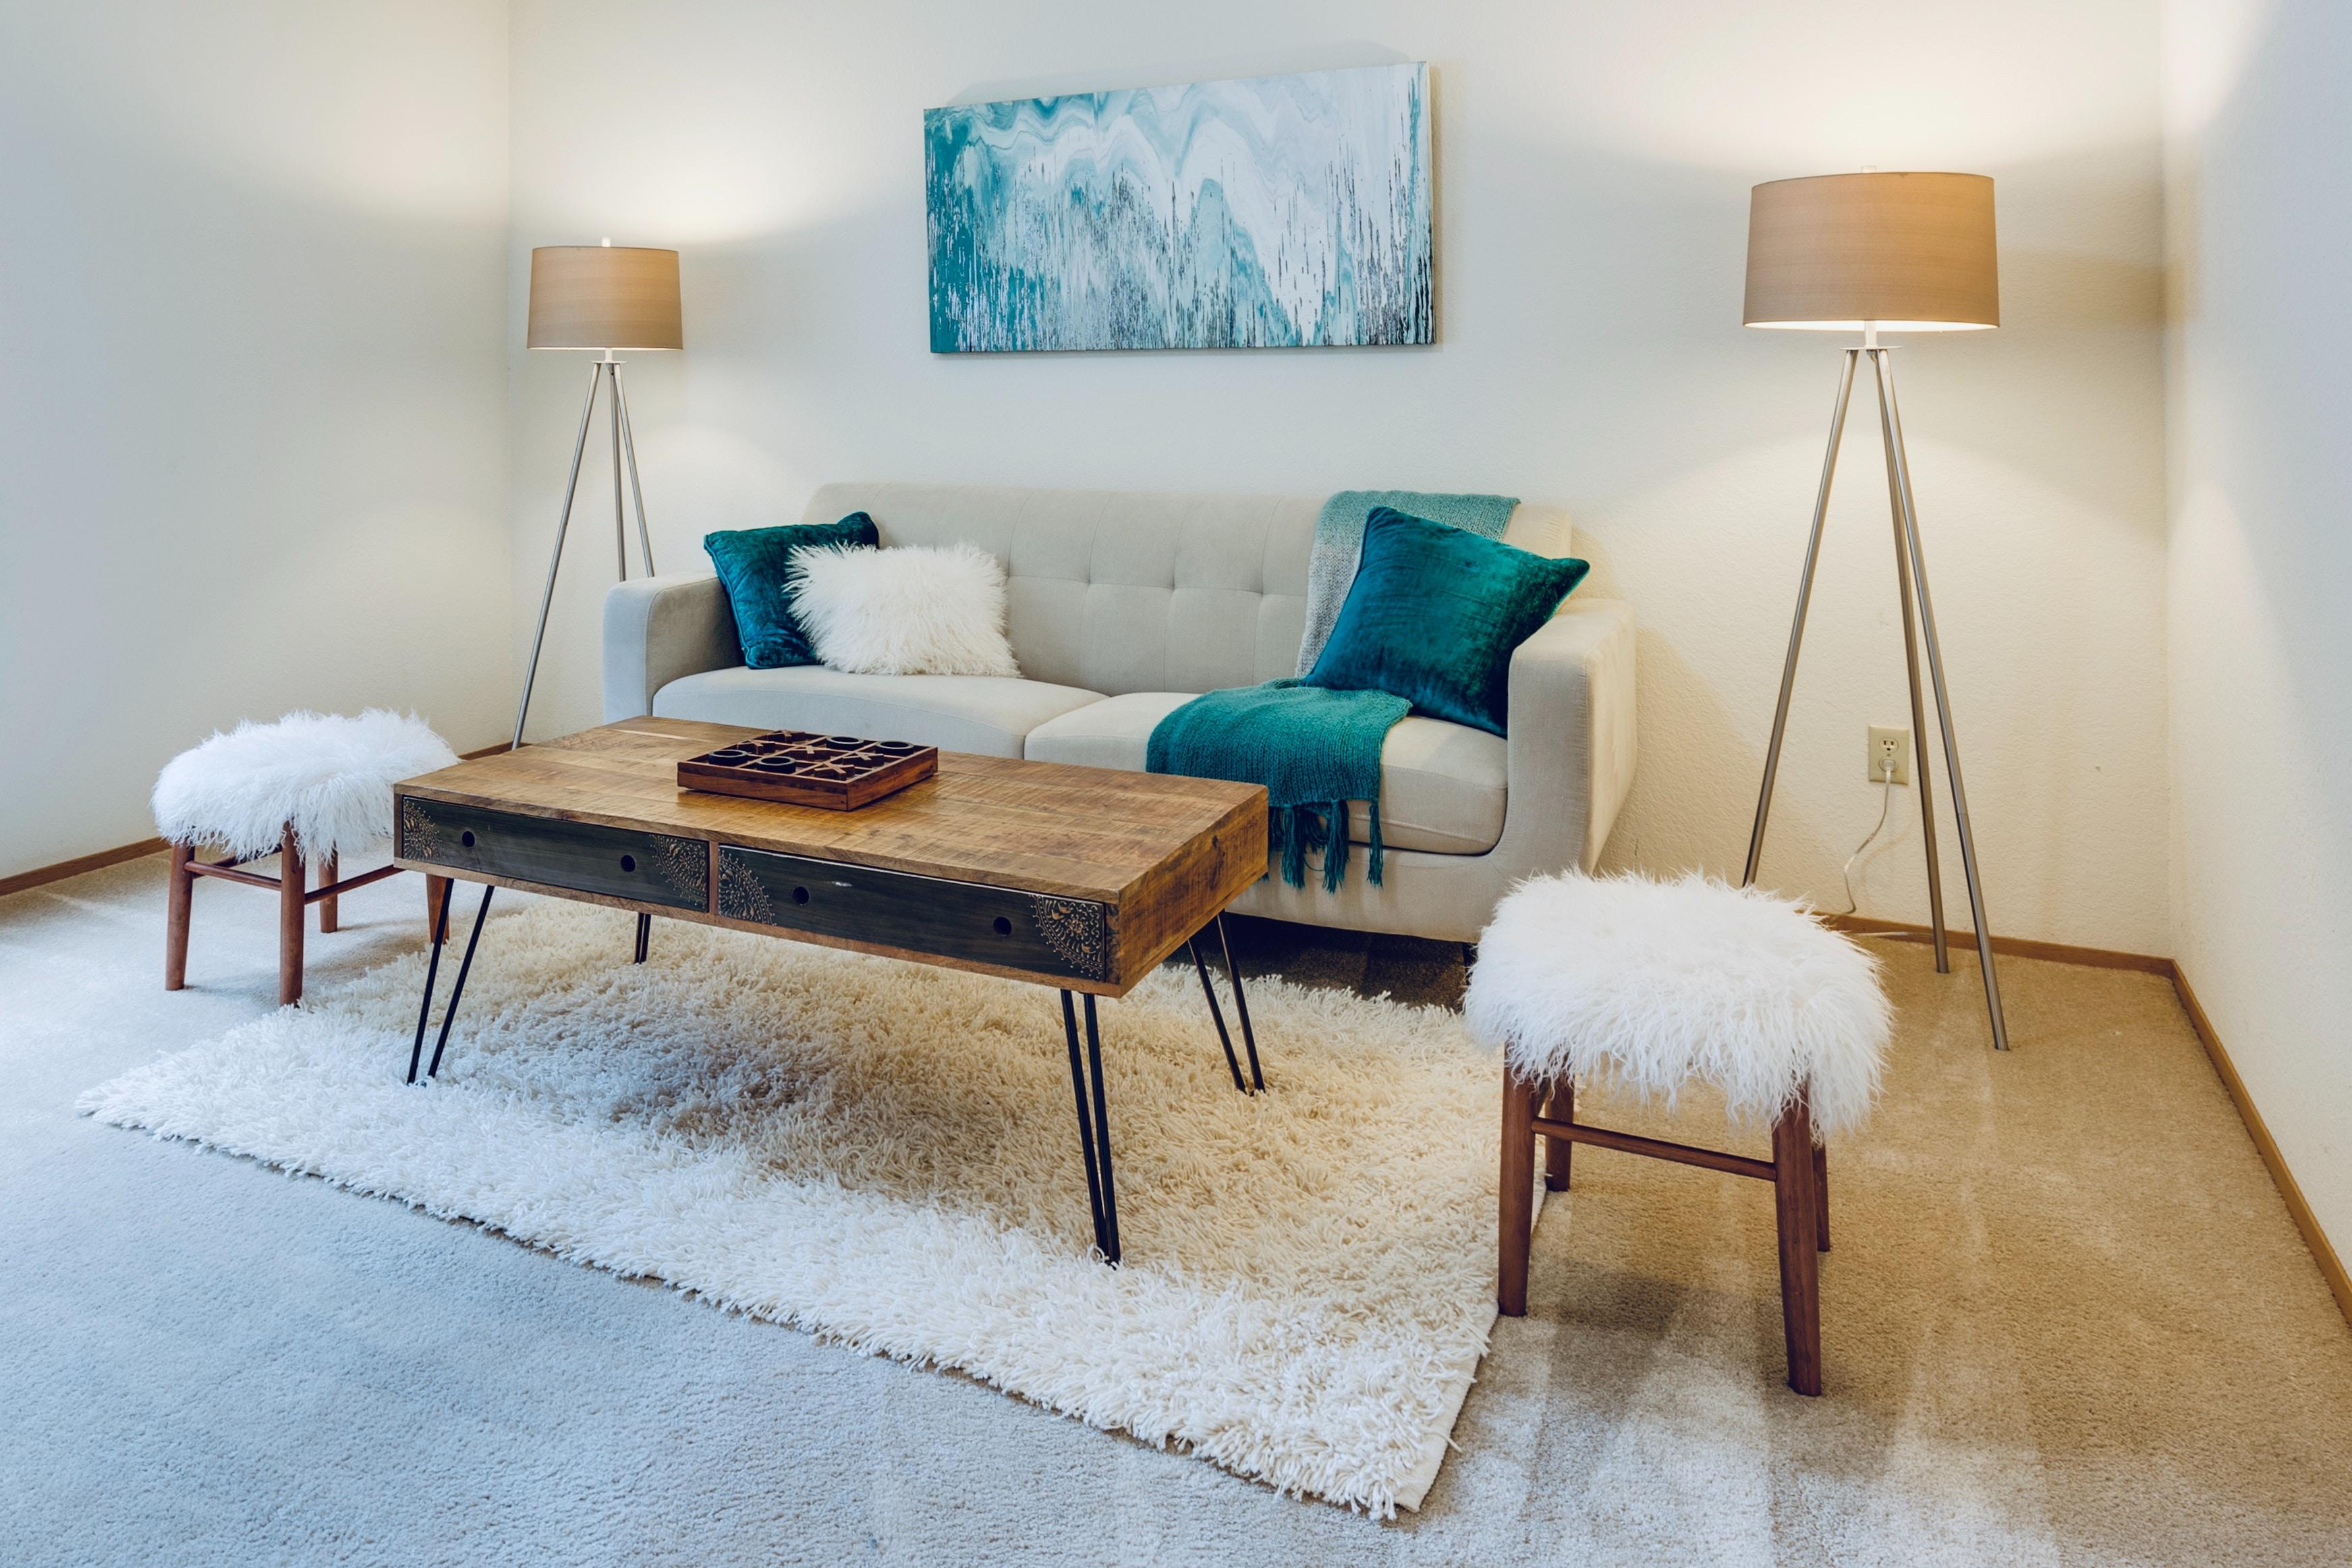 Interior Design Secrets That Will Save You Money